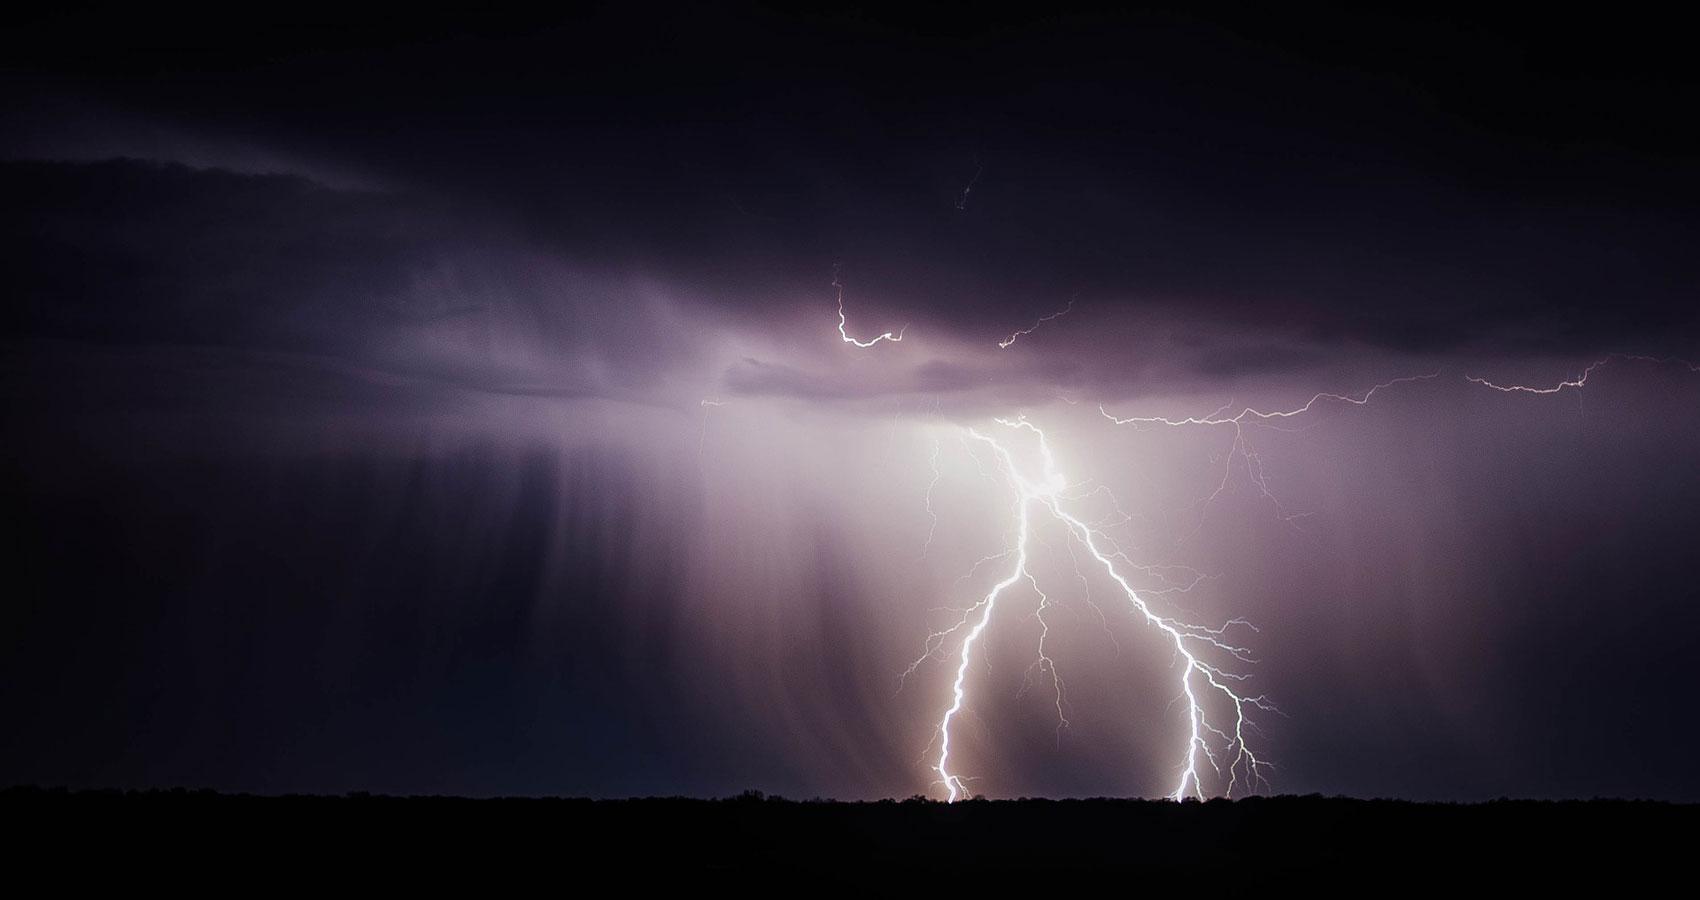 Thunder, a poem written by Sheri M. Stewart at Spillwords.com